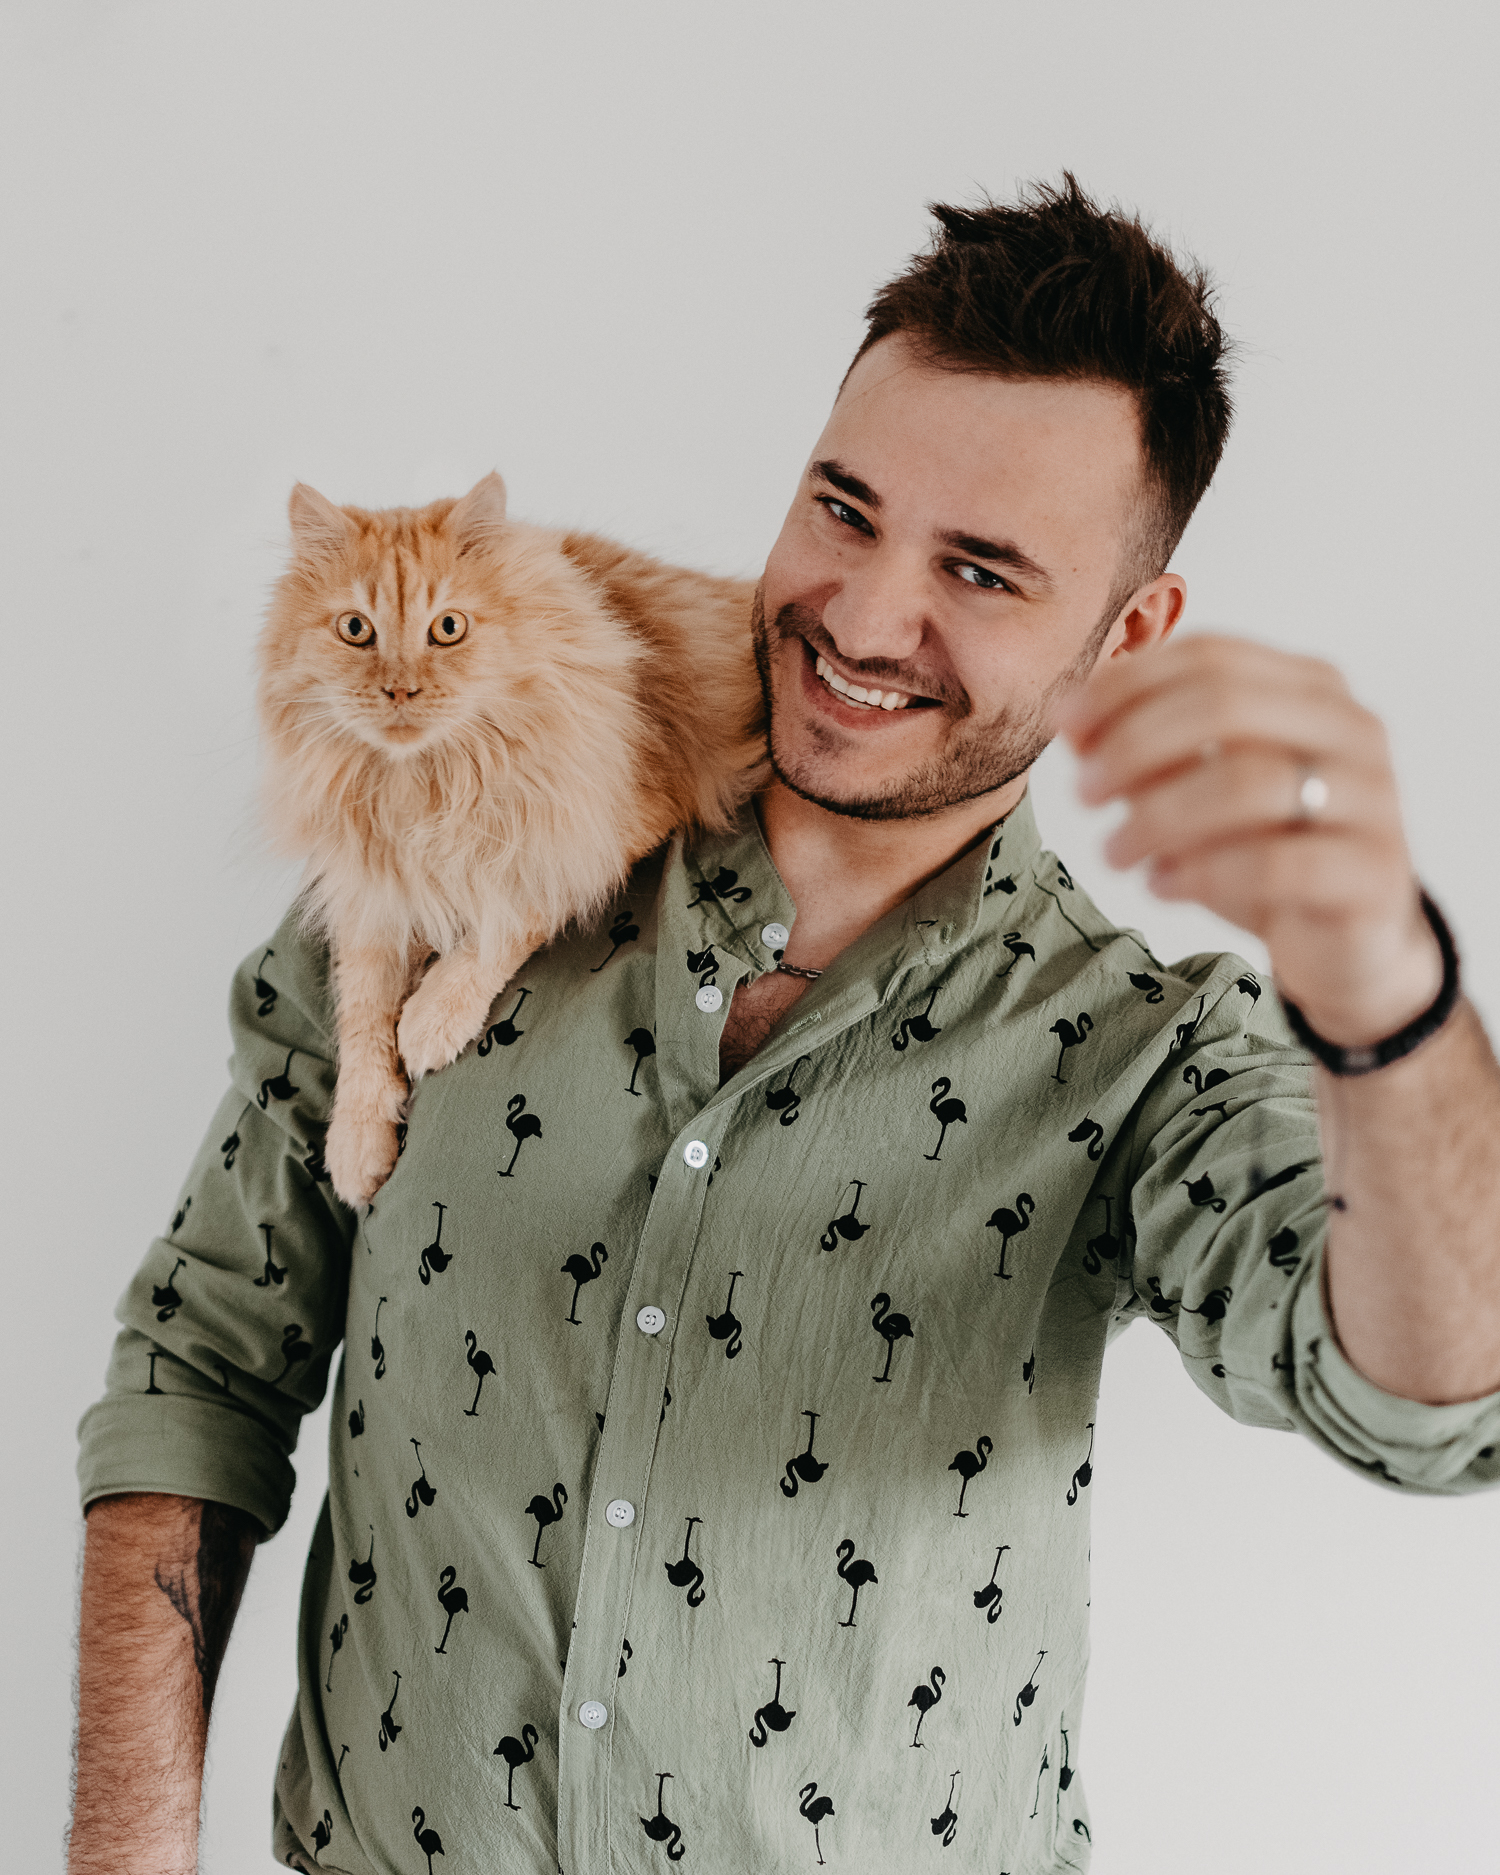 Cute orange cat sitting on man's shoulder